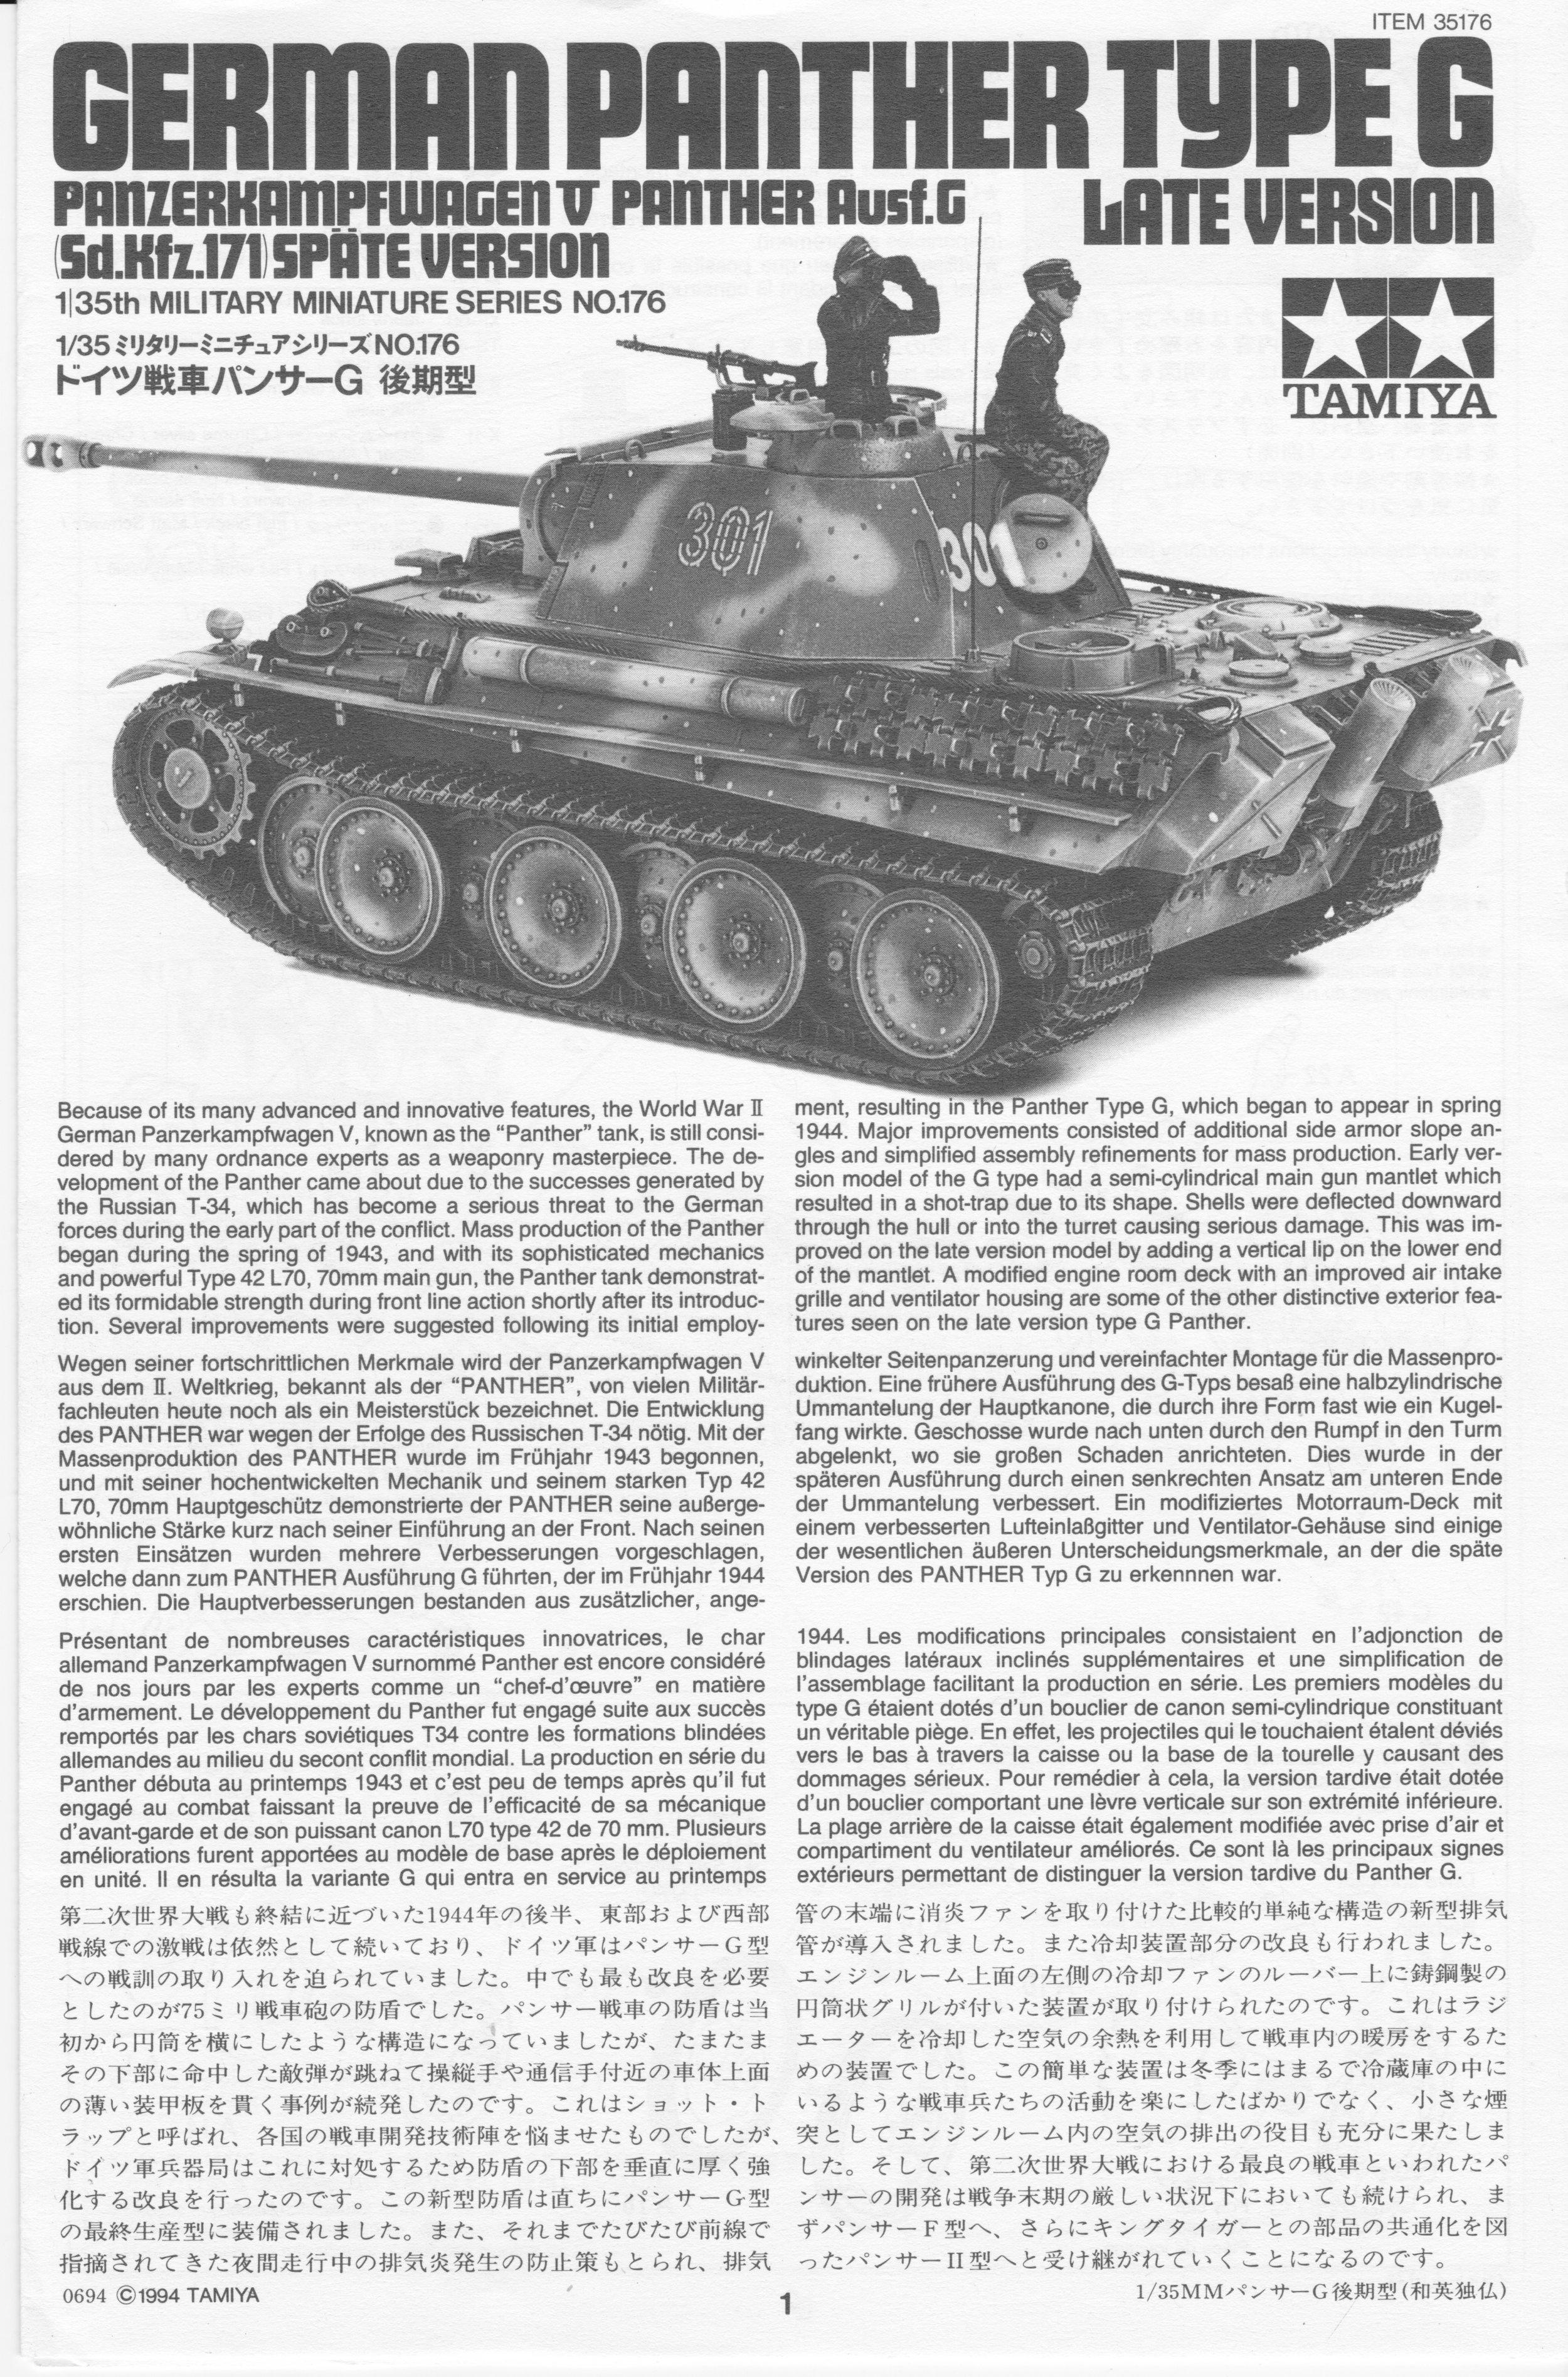 Späte Version G Panther Ausf Tamiya 35176 171-1:35 Sd.Kfz